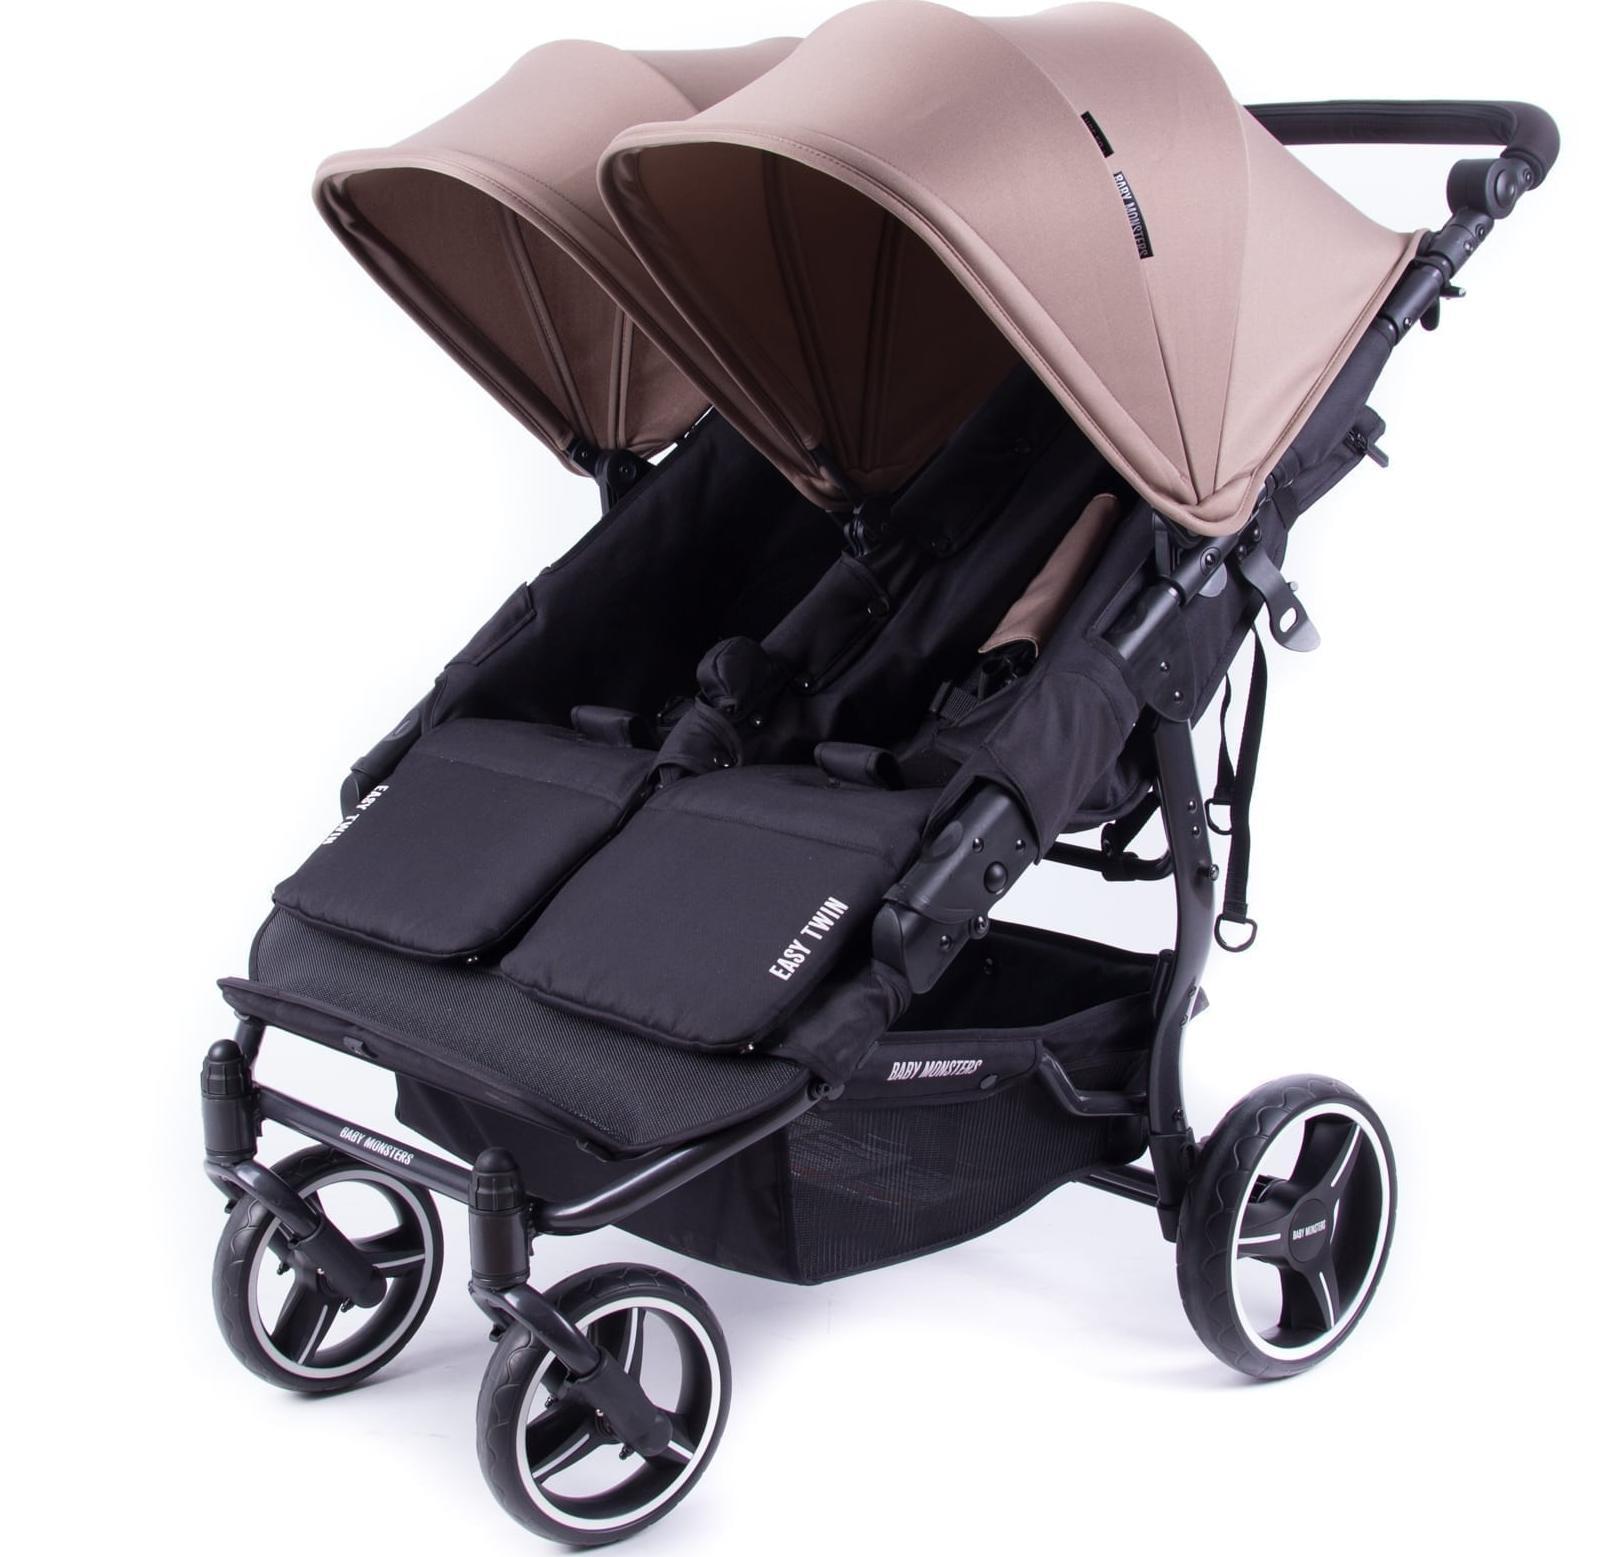 Easy 3s Monster Baby Twin Silla Cochecito Gemelar wm8n0N